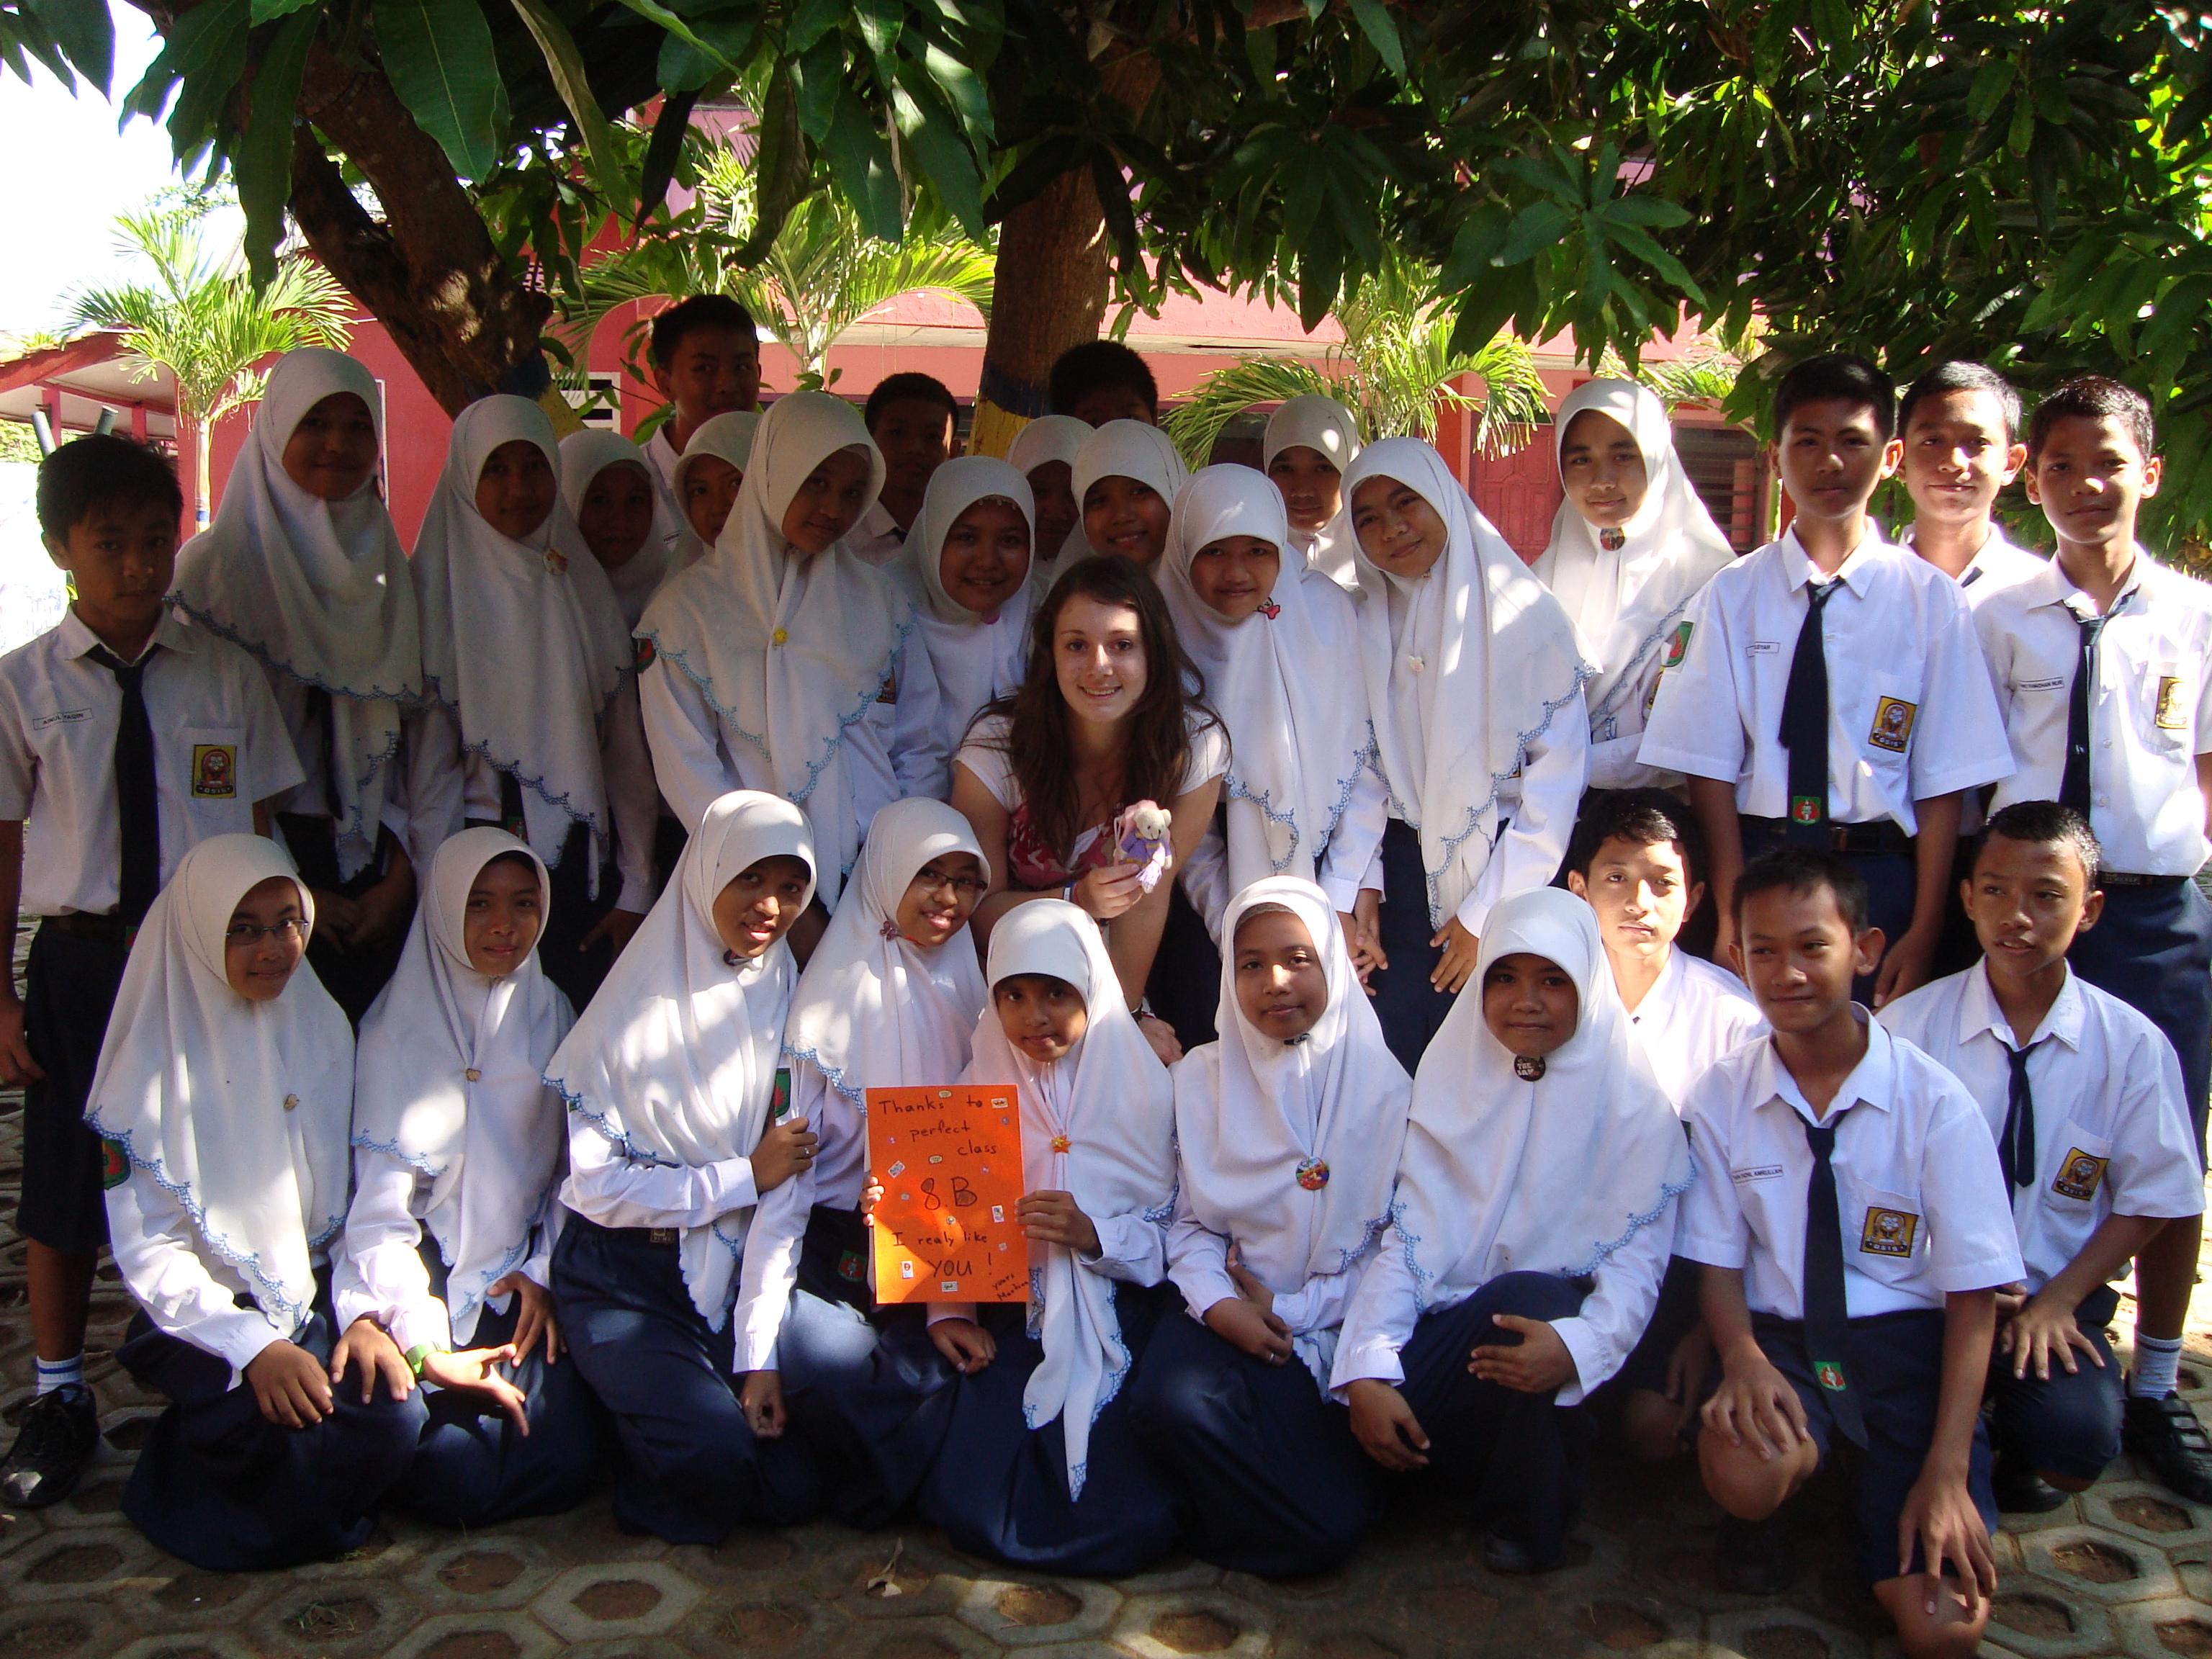 Moji úžasní studenti